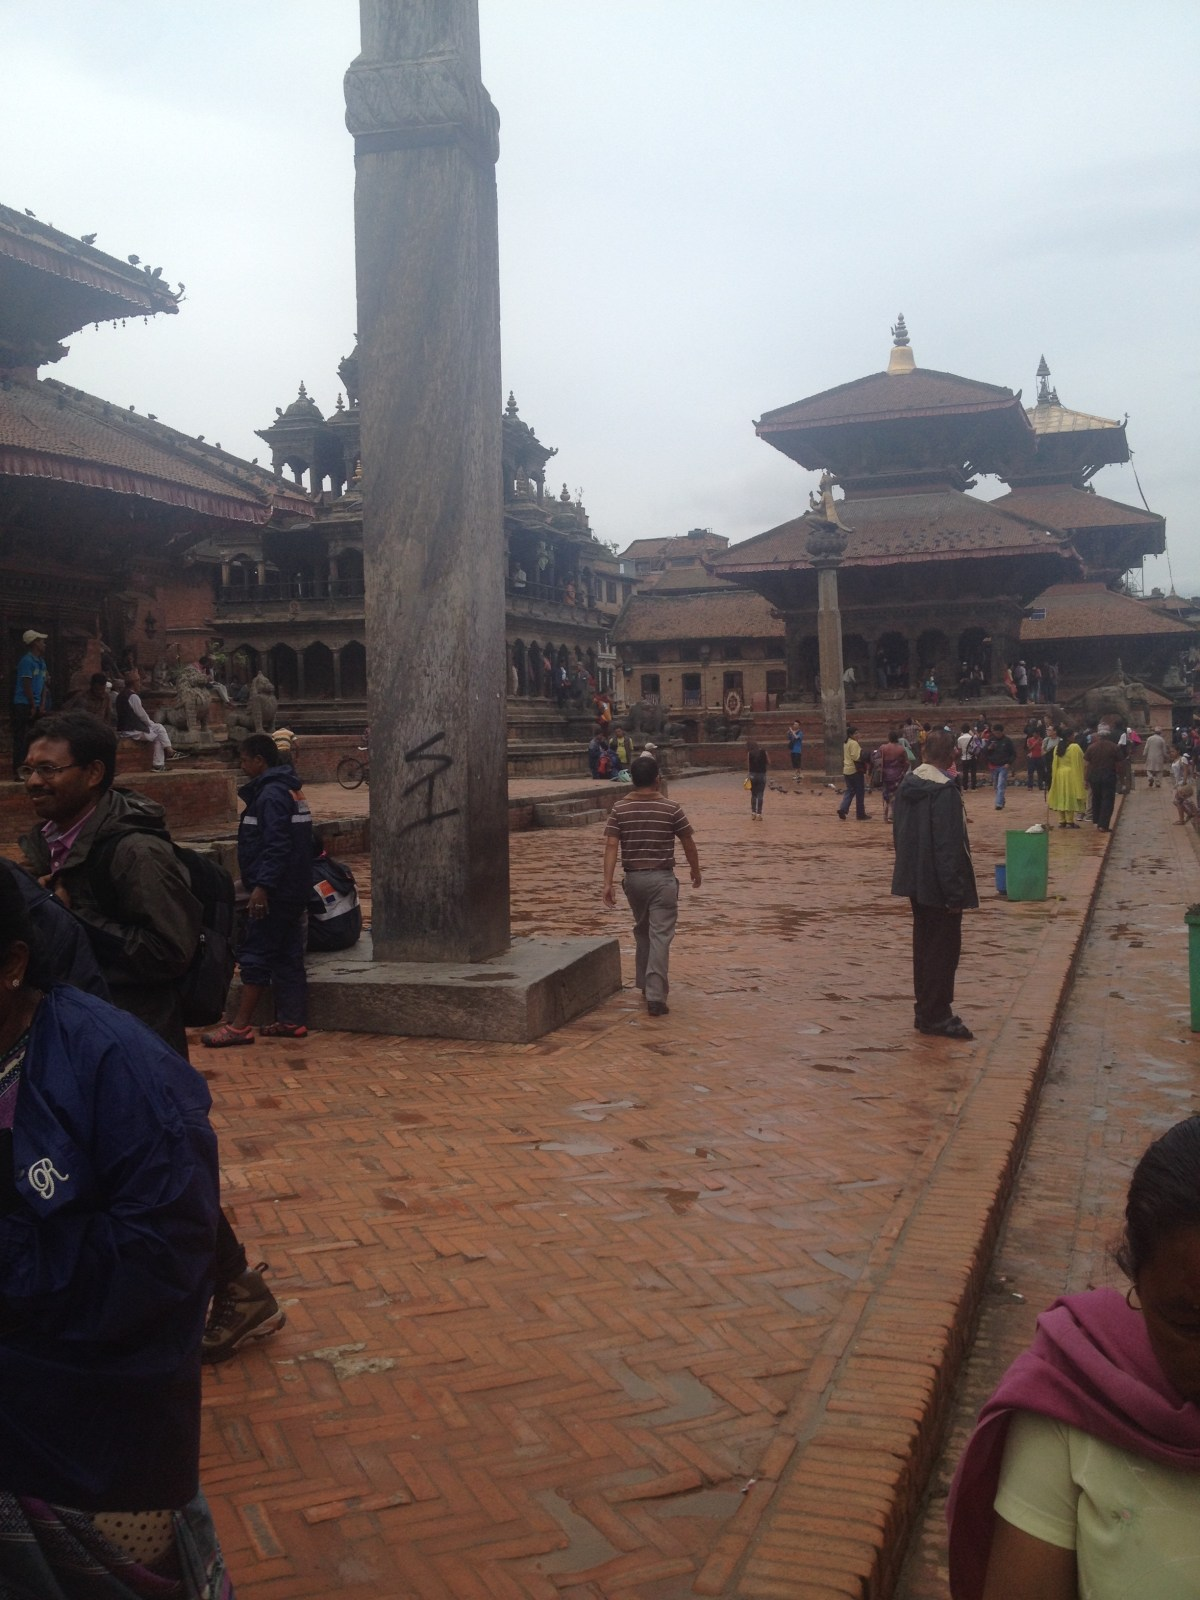 Nepal Travel: Tour of Kathmandu Durbar Square (2014)